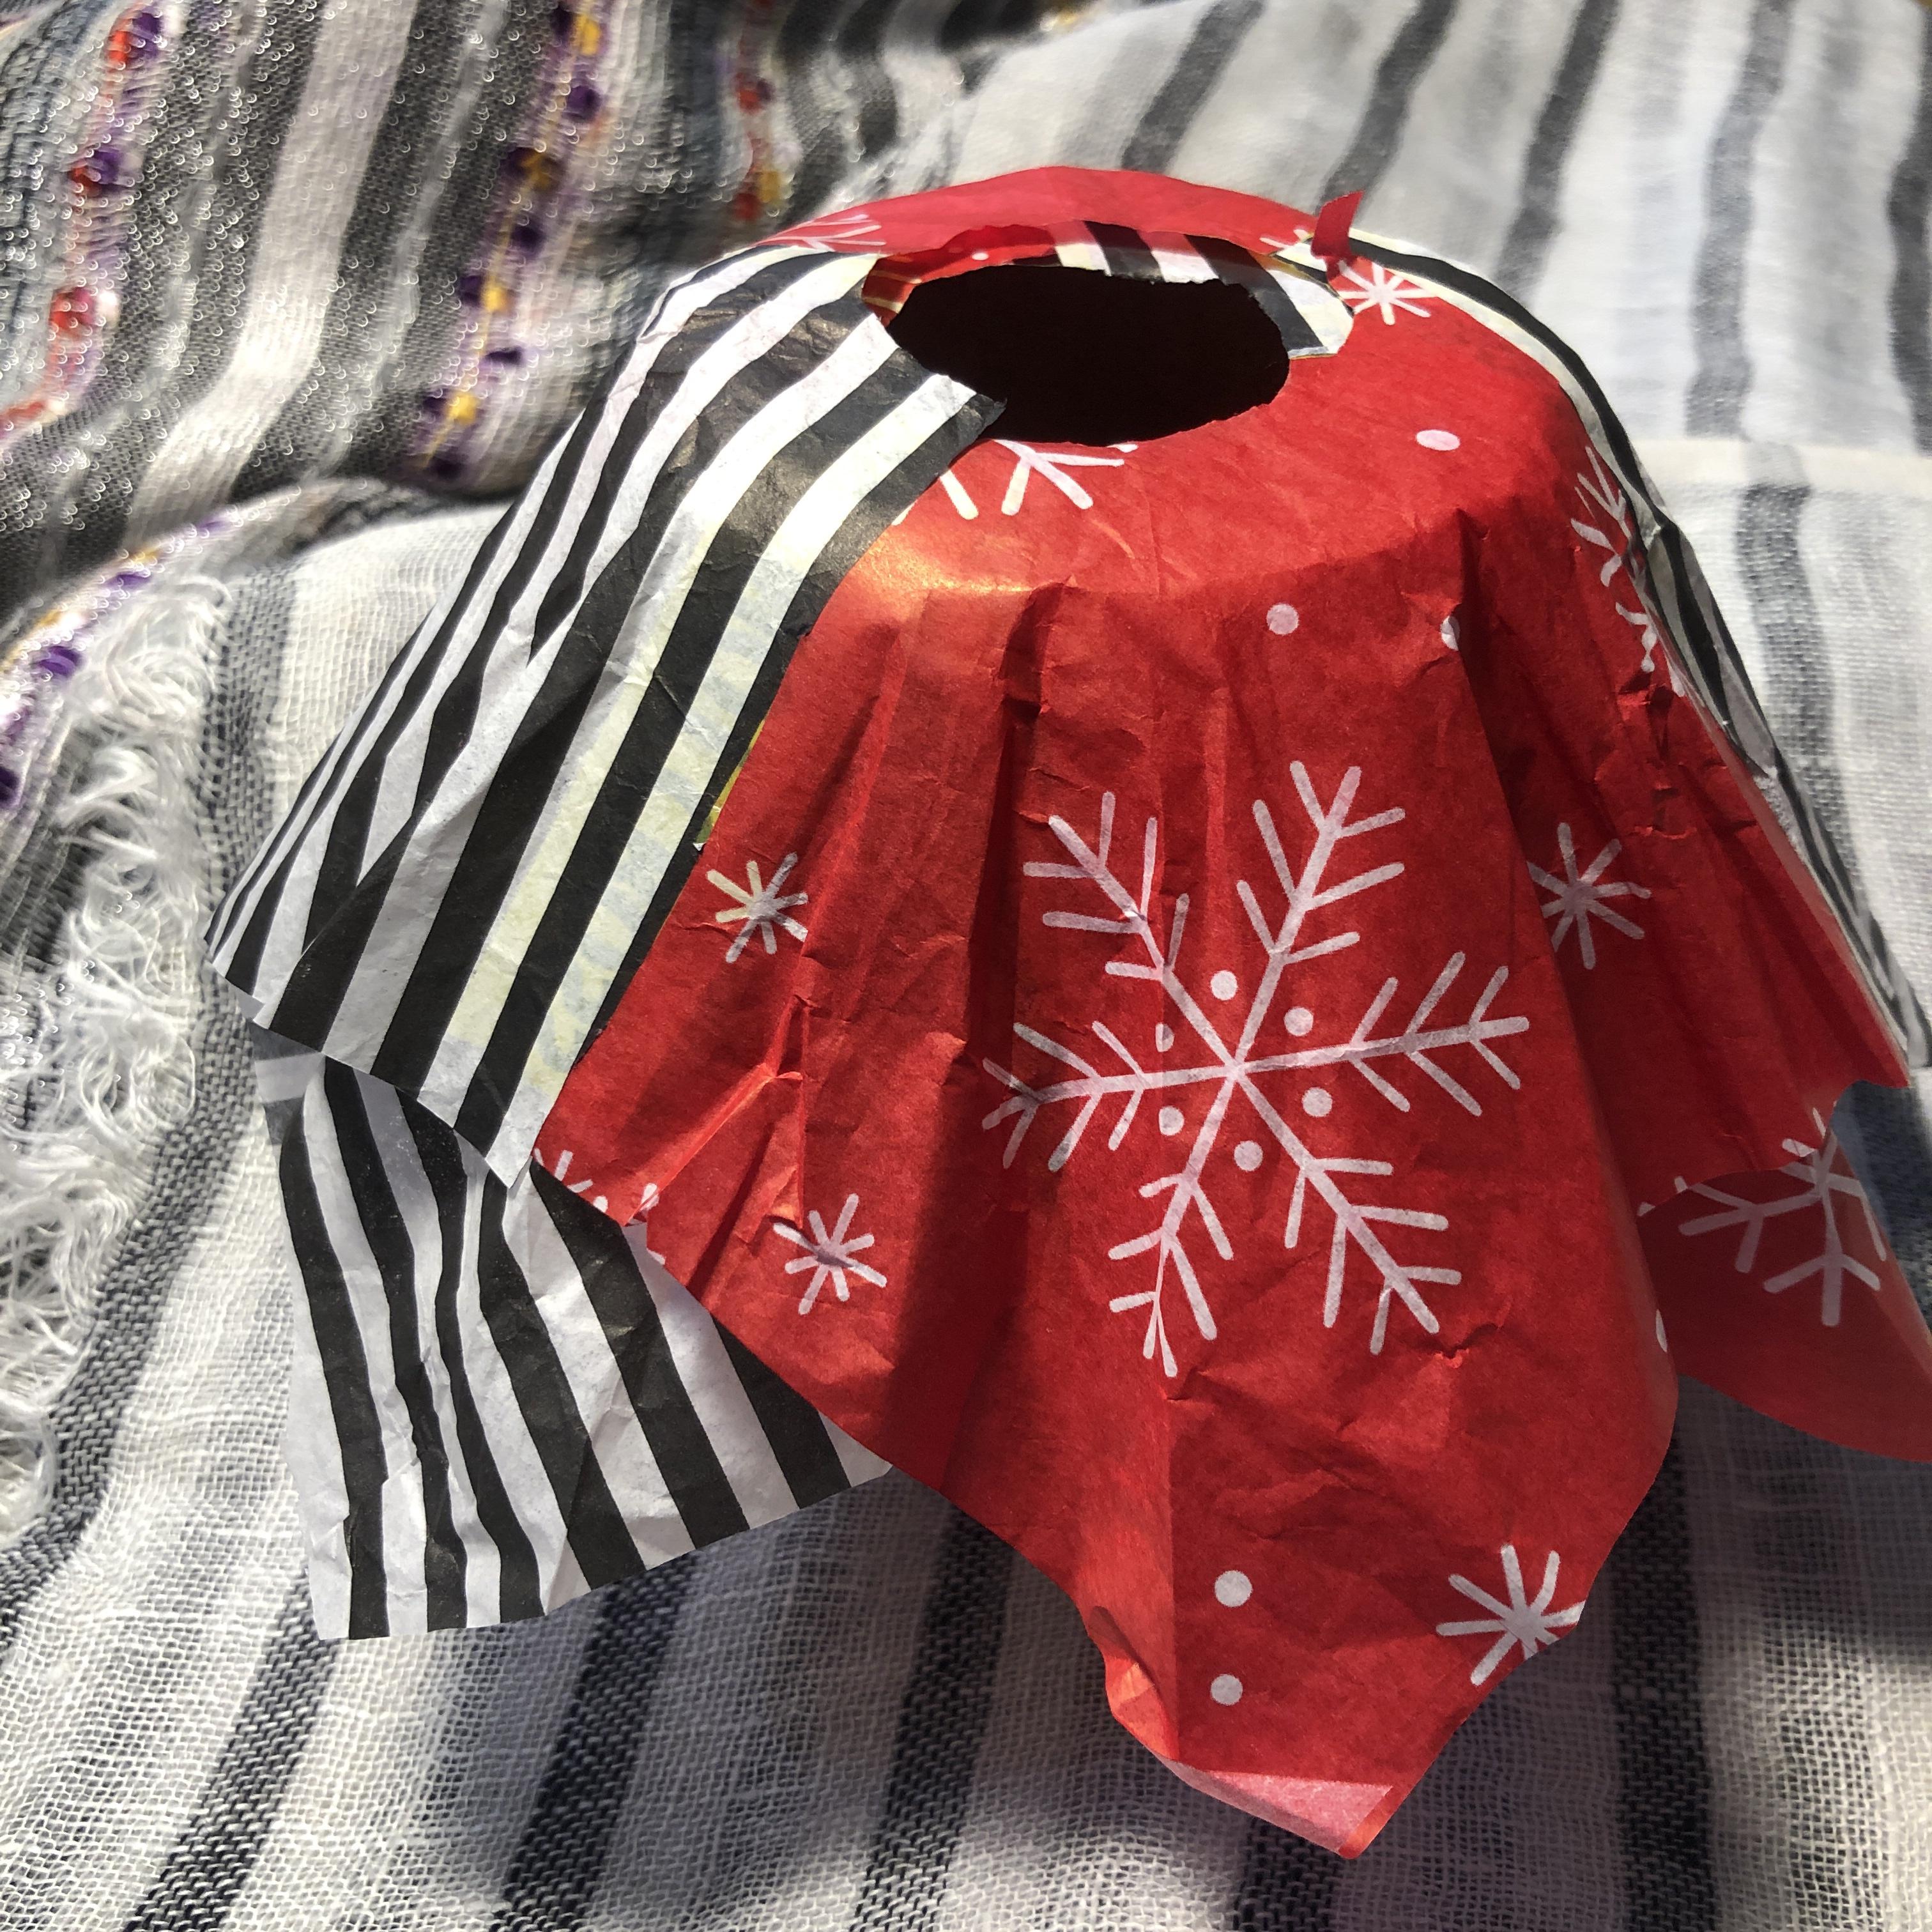 hankerchief skirt prototype made from tissue paper